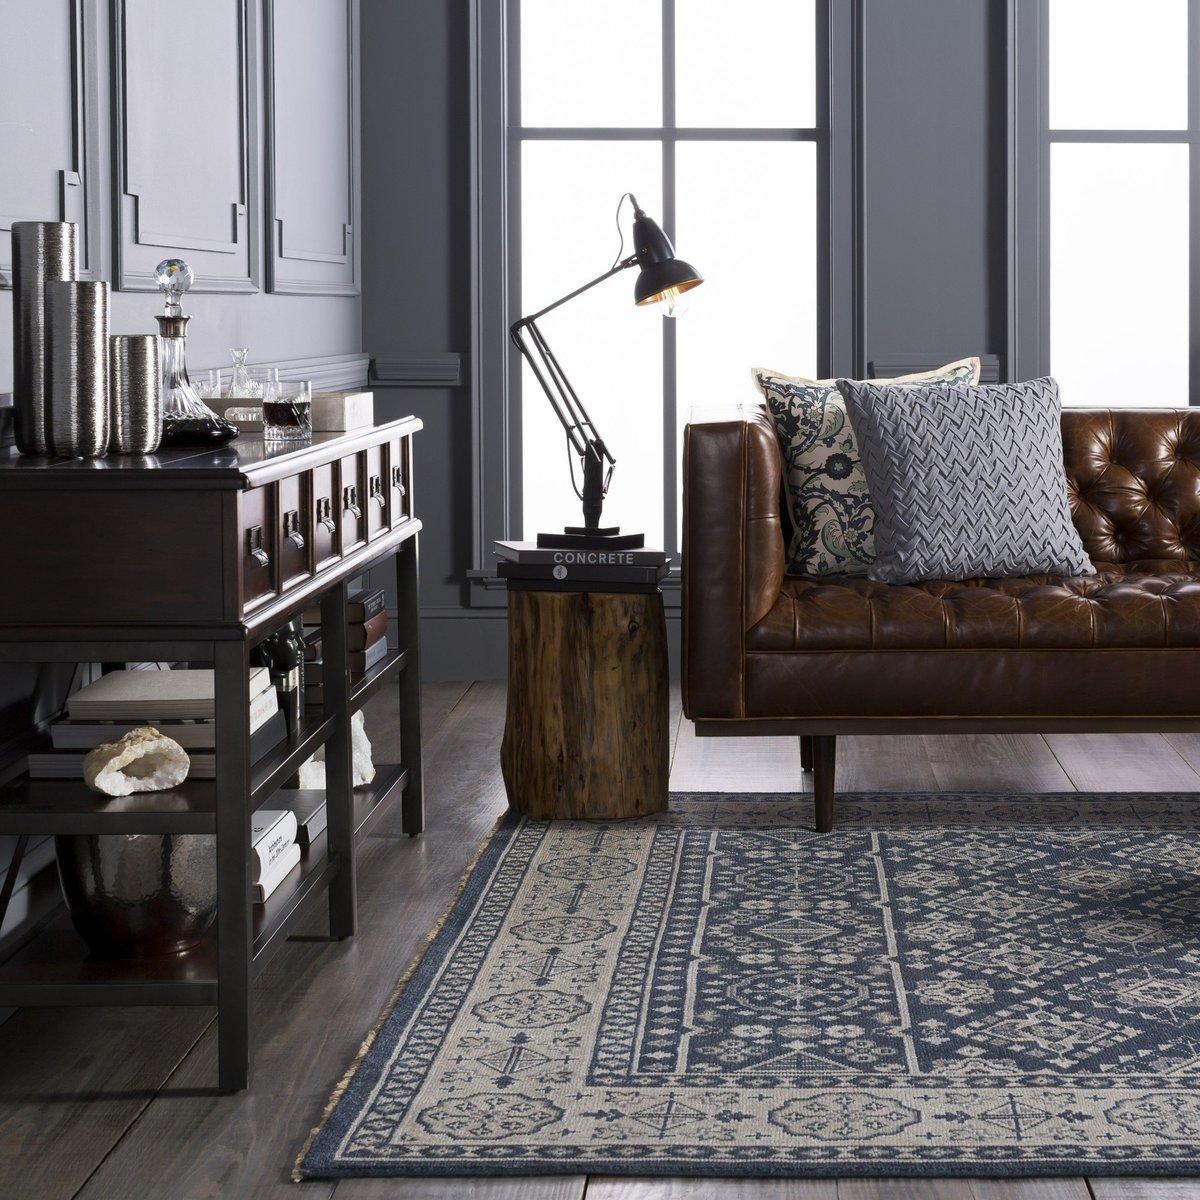 Dark and Moody - Formal Living Room Design Tips